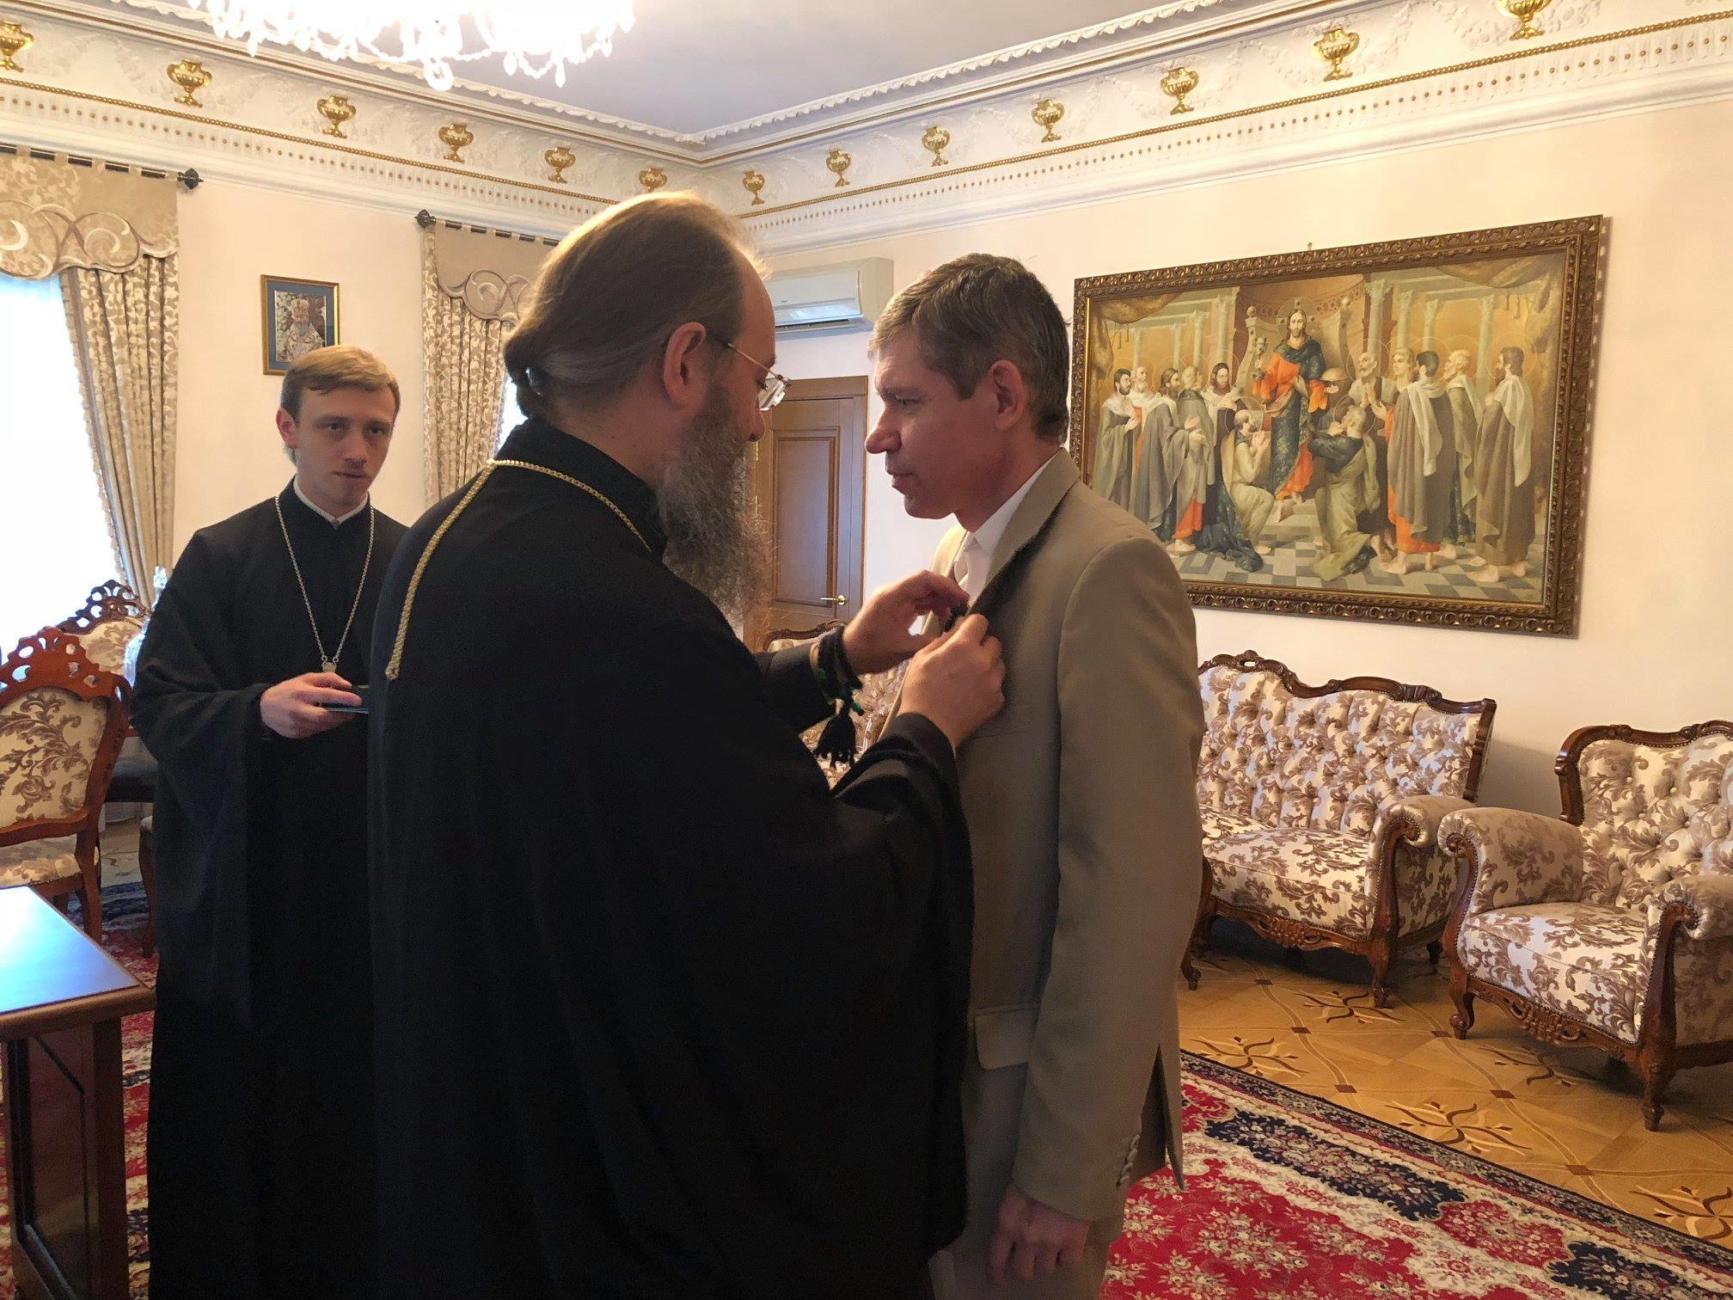 https://news.church.ua/files/2018/05/02-30-05-2018a-1.jpg